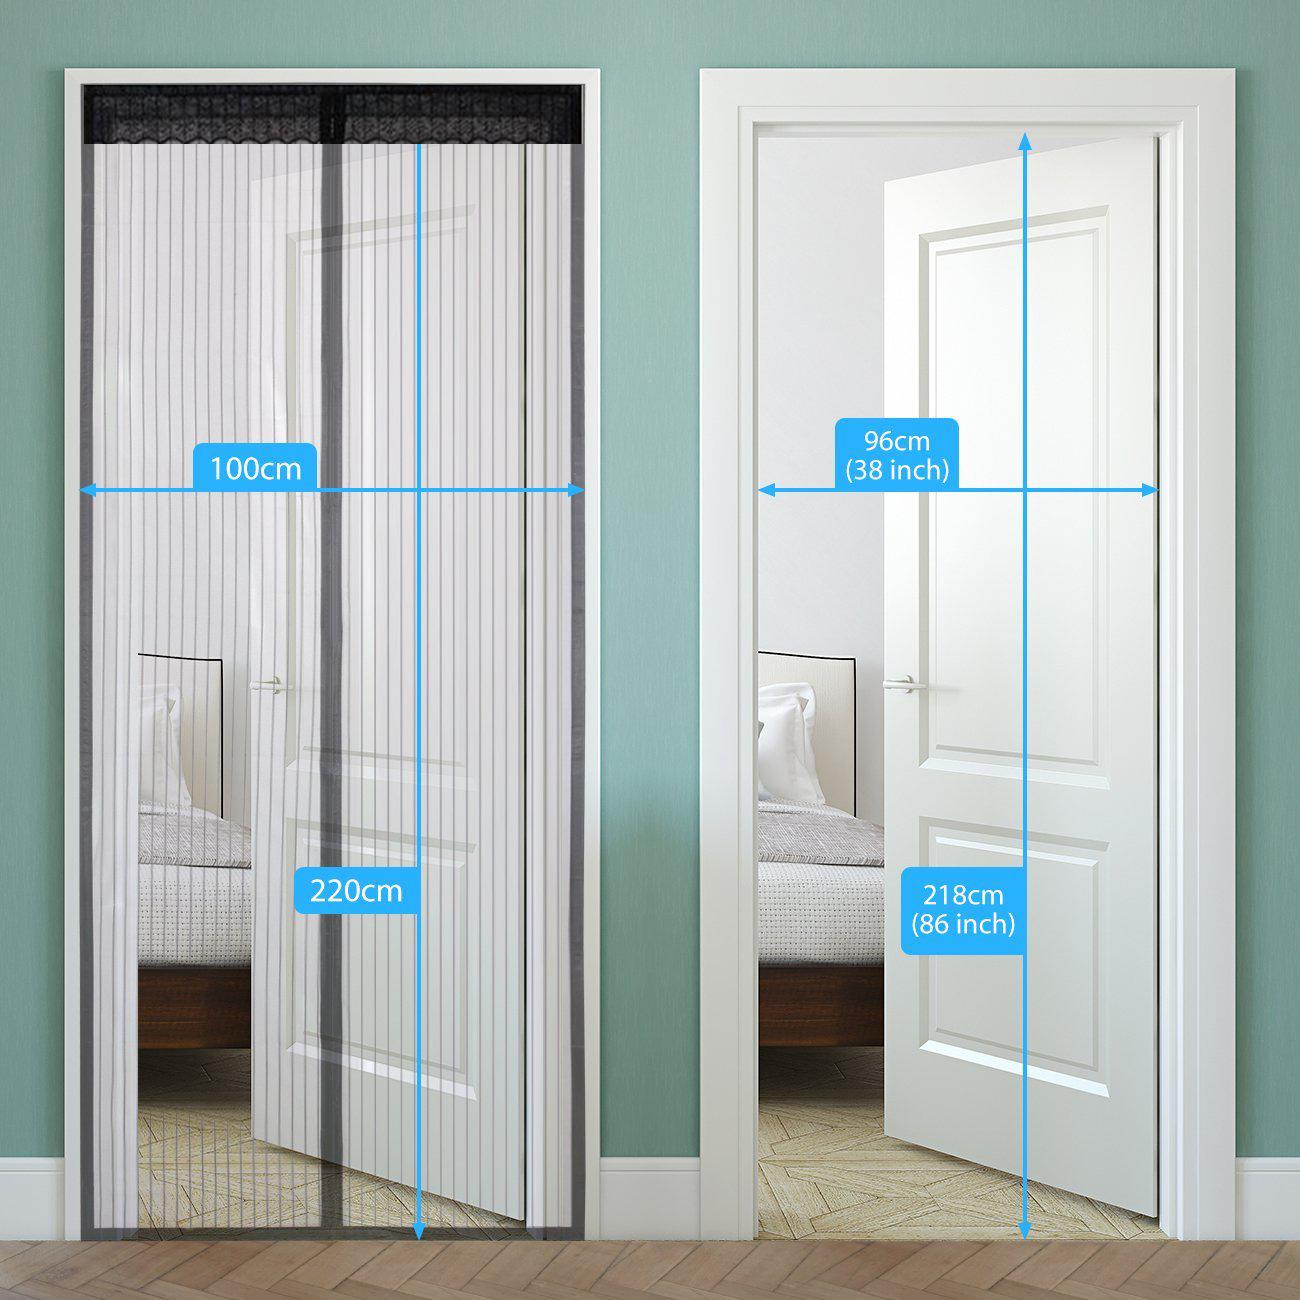 Magic Door Mesh Magnetic Curtain Fastening Hands Free